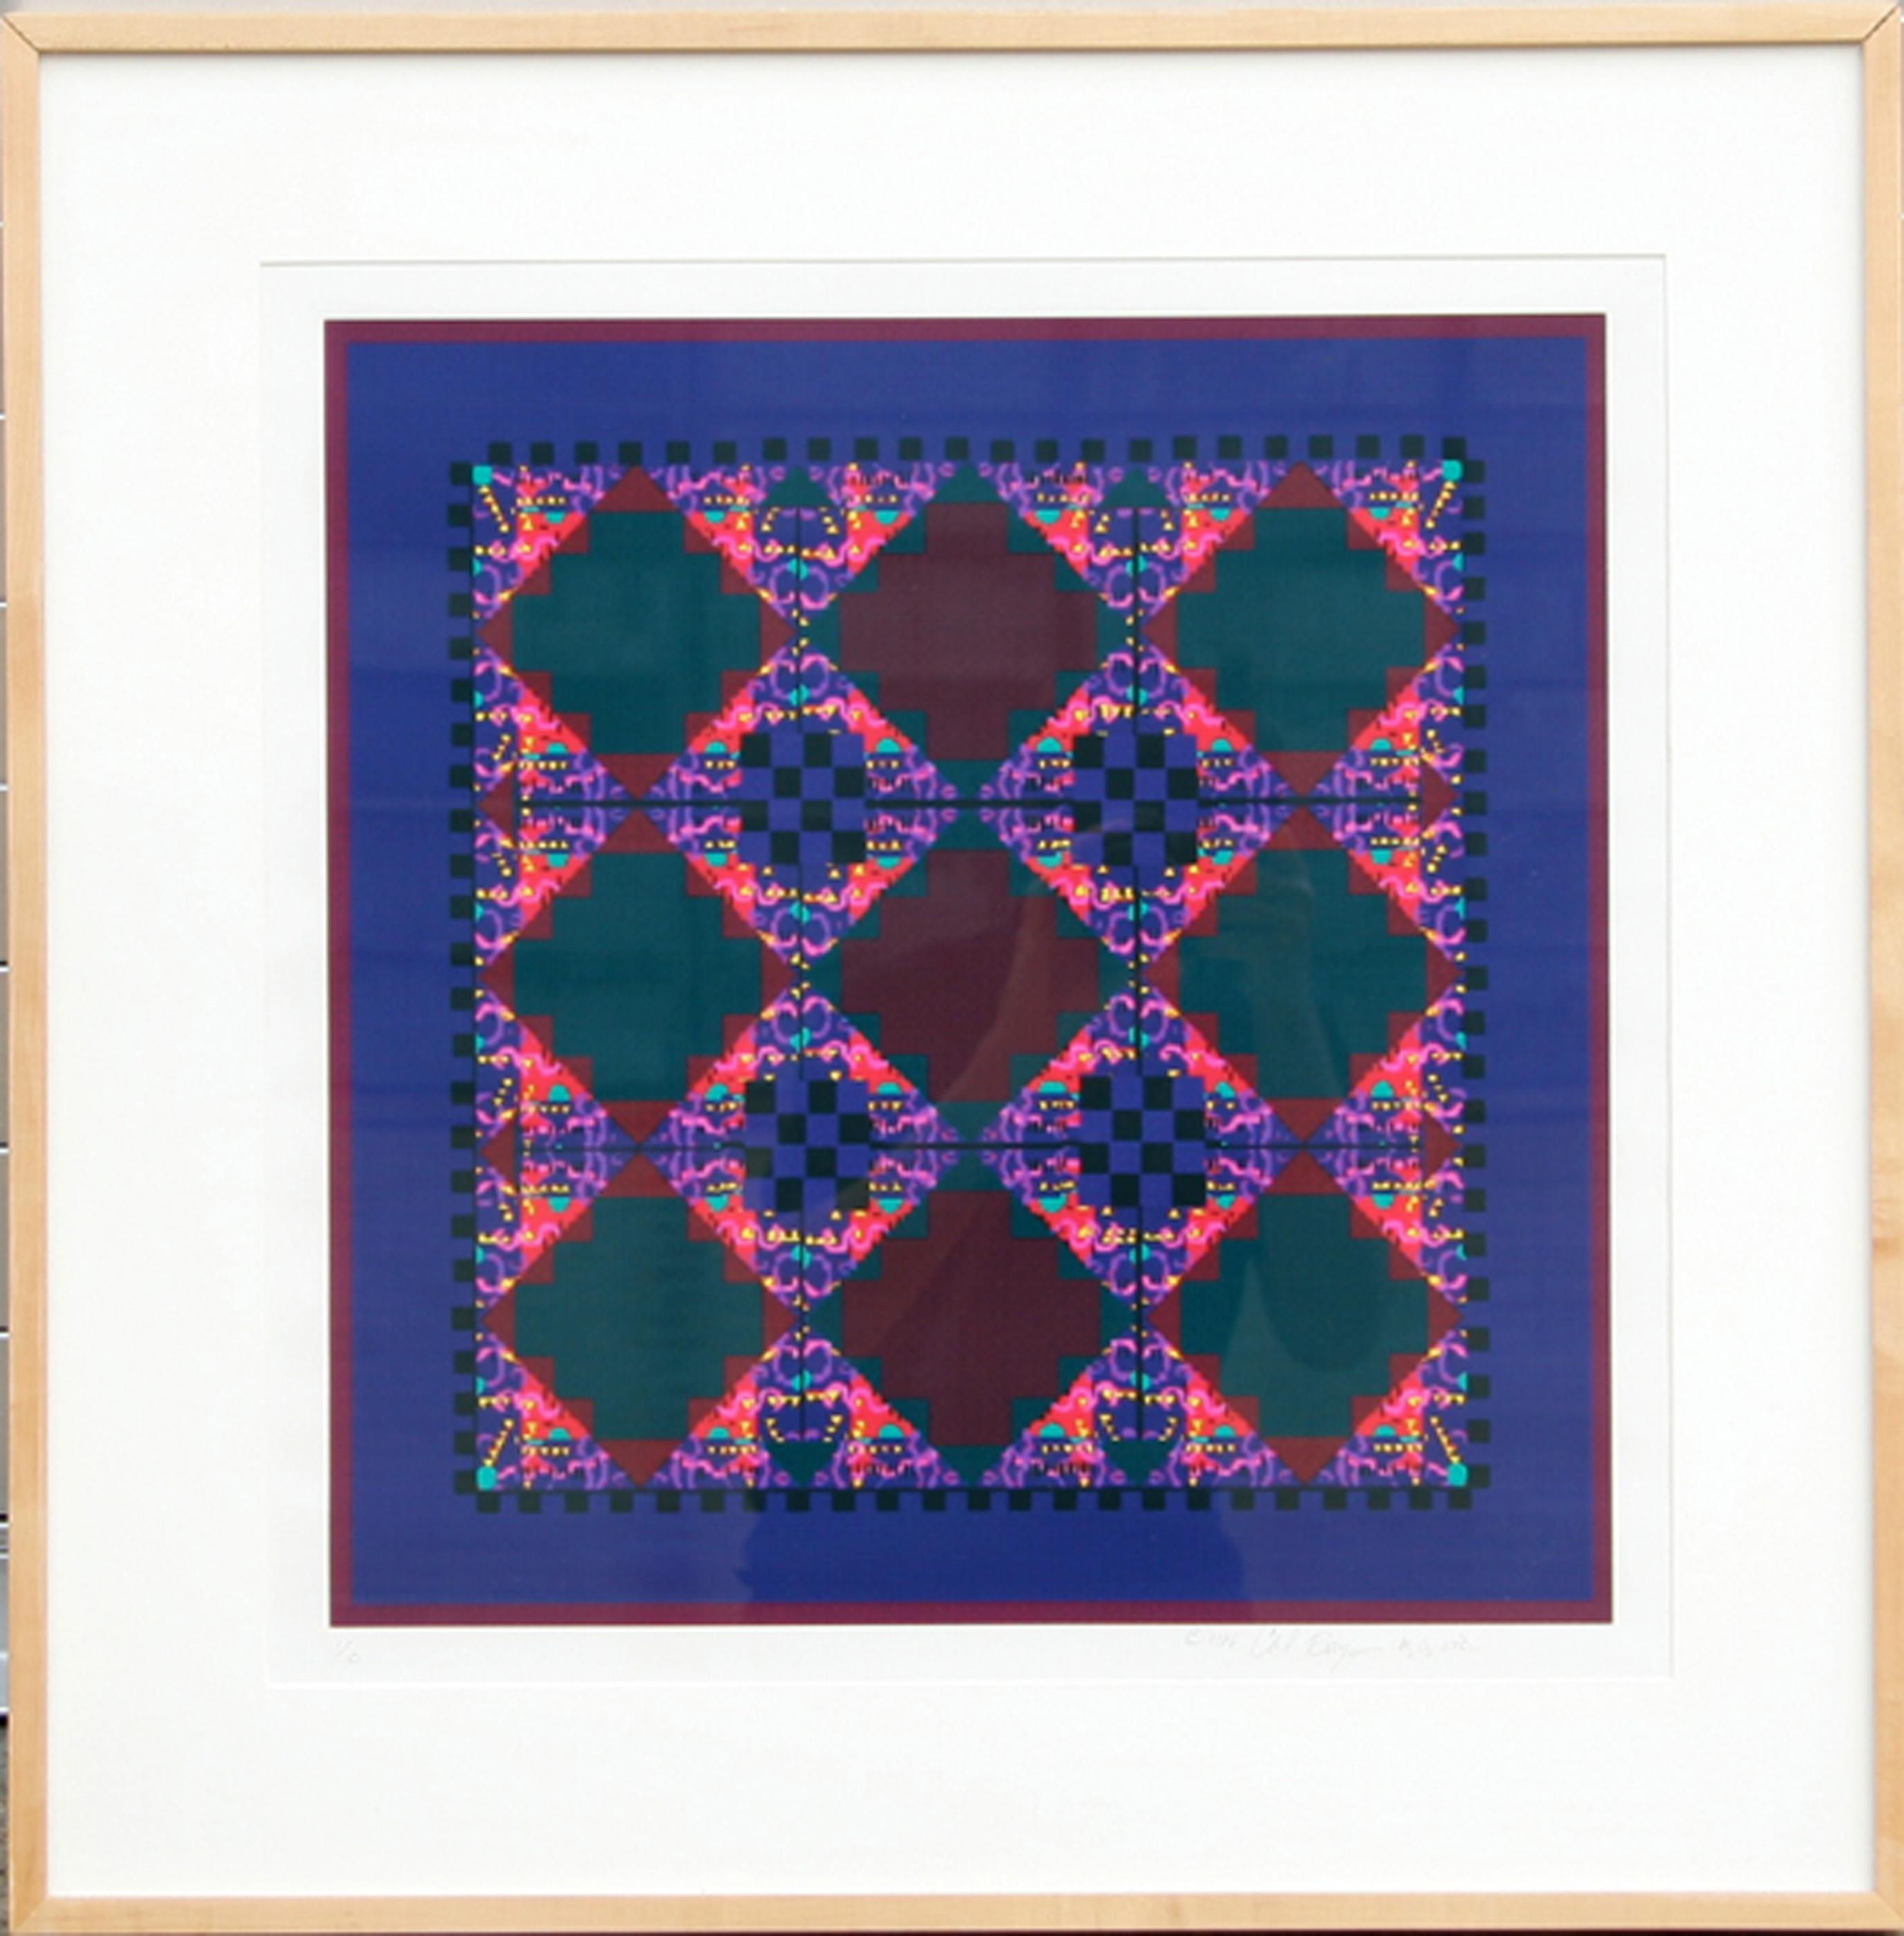 Carol Bouyoucos, Visual Chemistry - Textile III, Digital Print